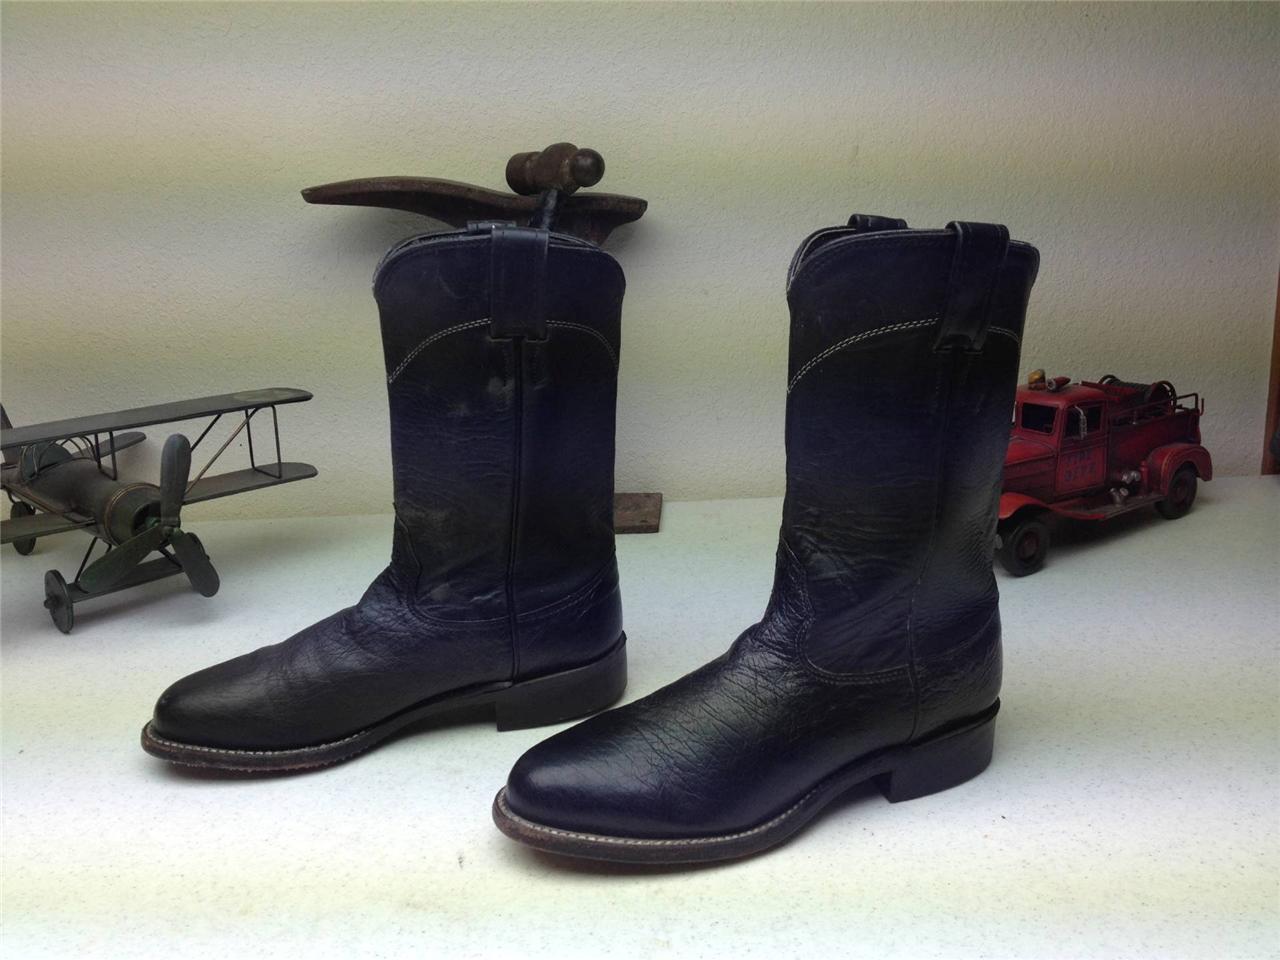 LARRY MAHAN DISTRESSED WESTERN ROPER DARK blueE-BLACK WORK CHORE FARM BOOTS 5 B